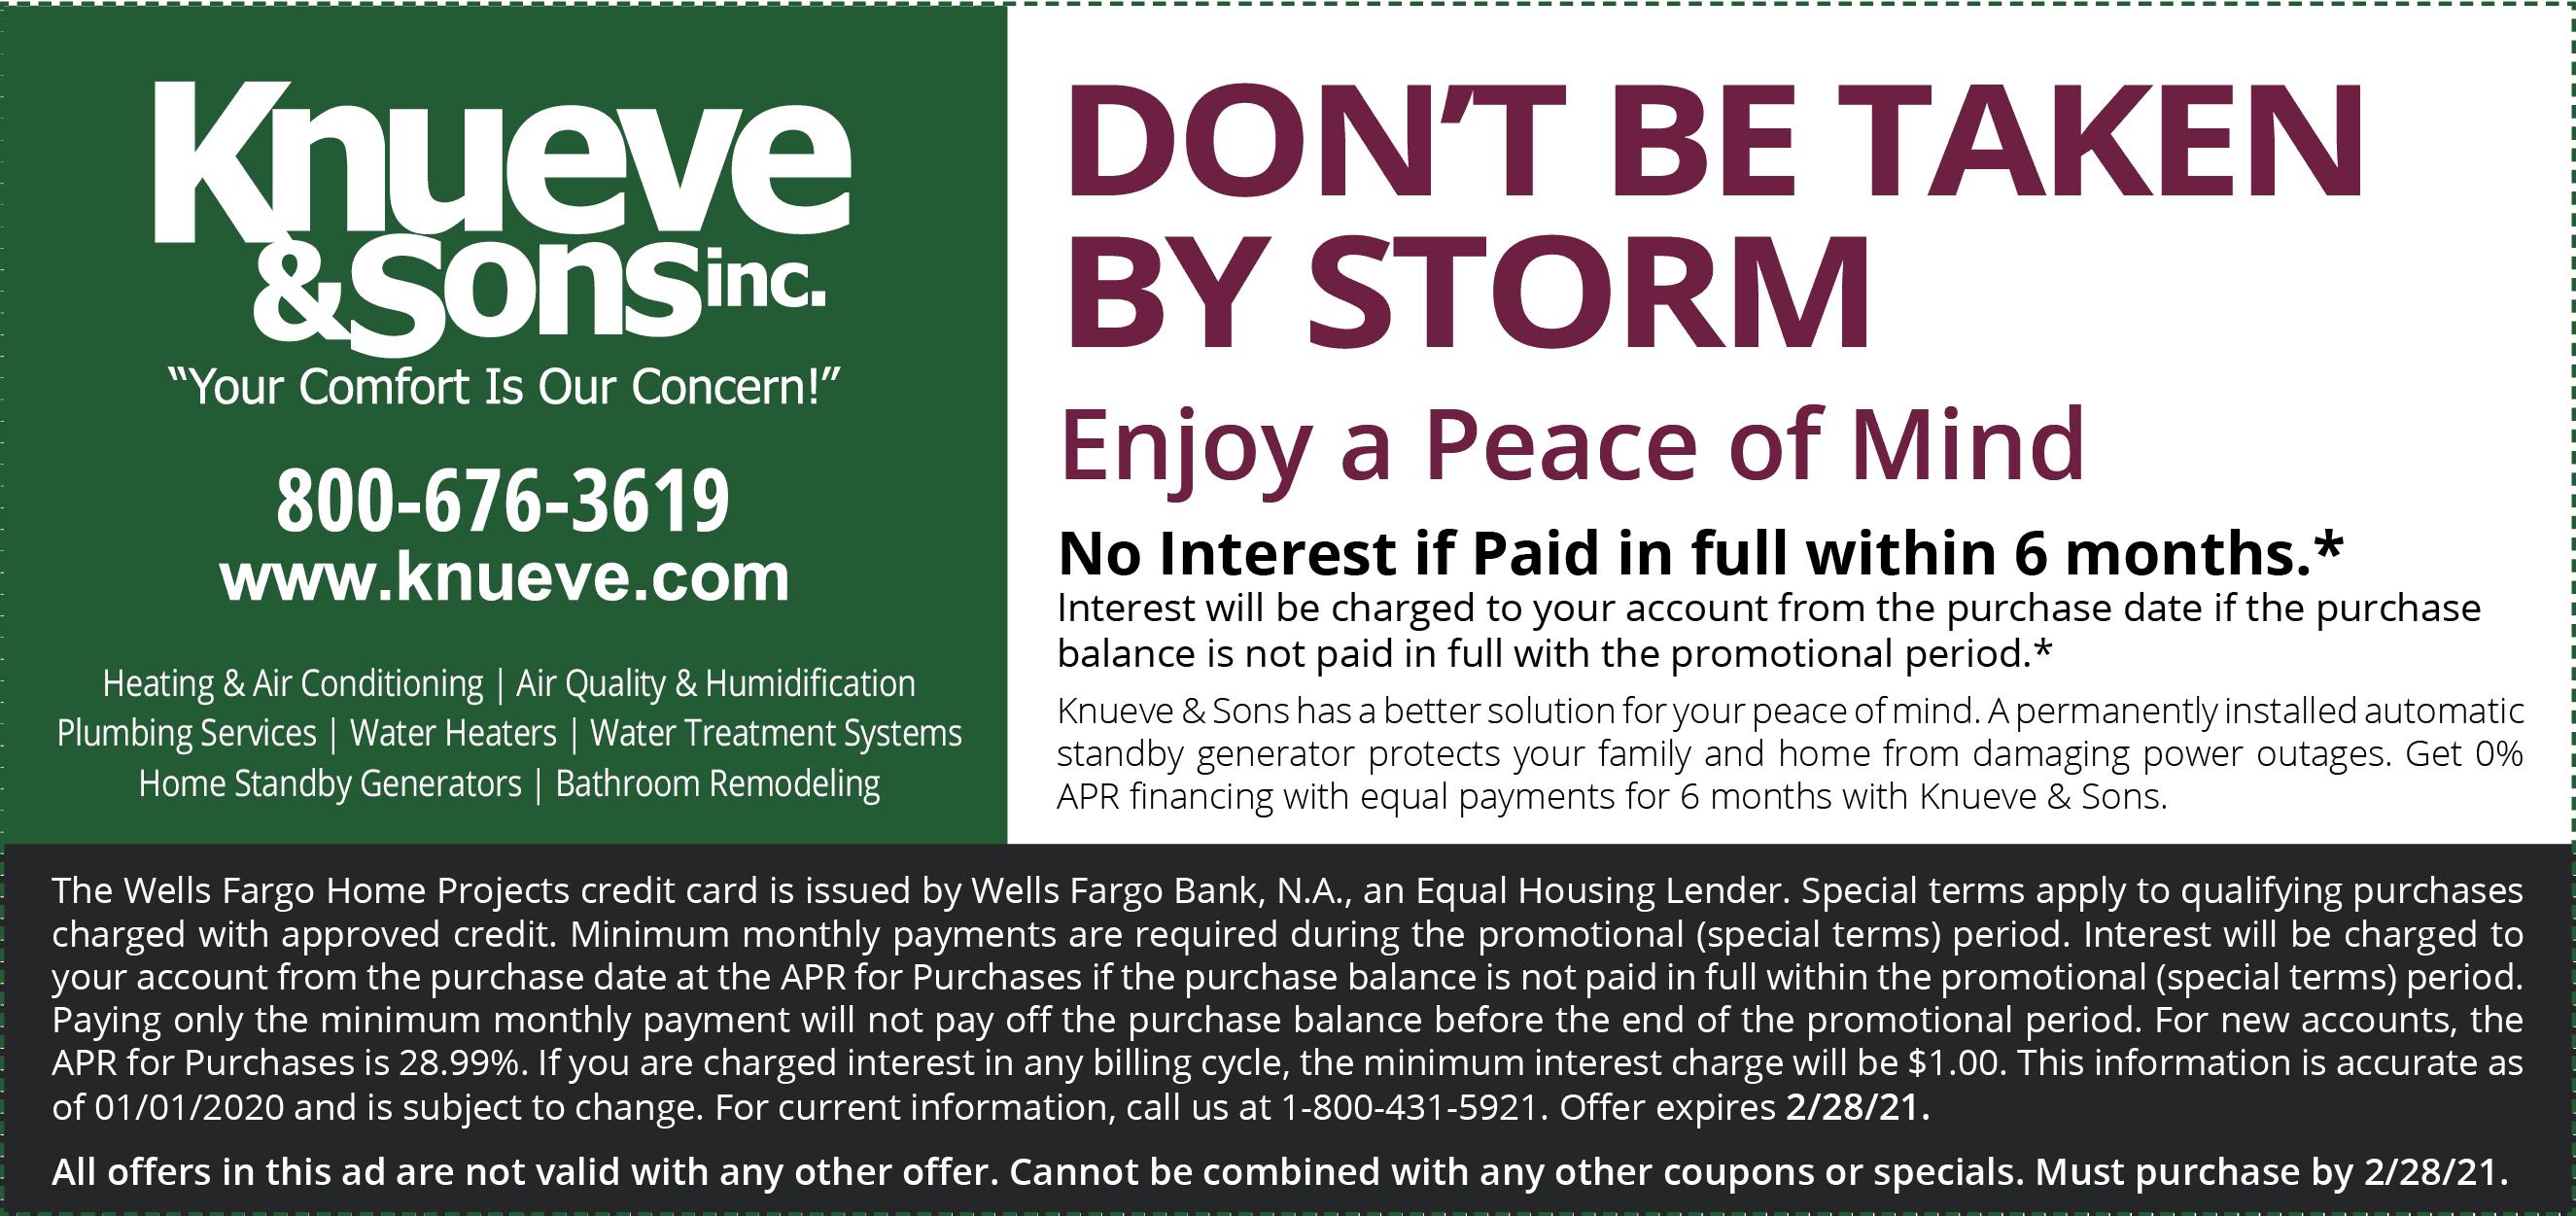 KNU-Taken by storm